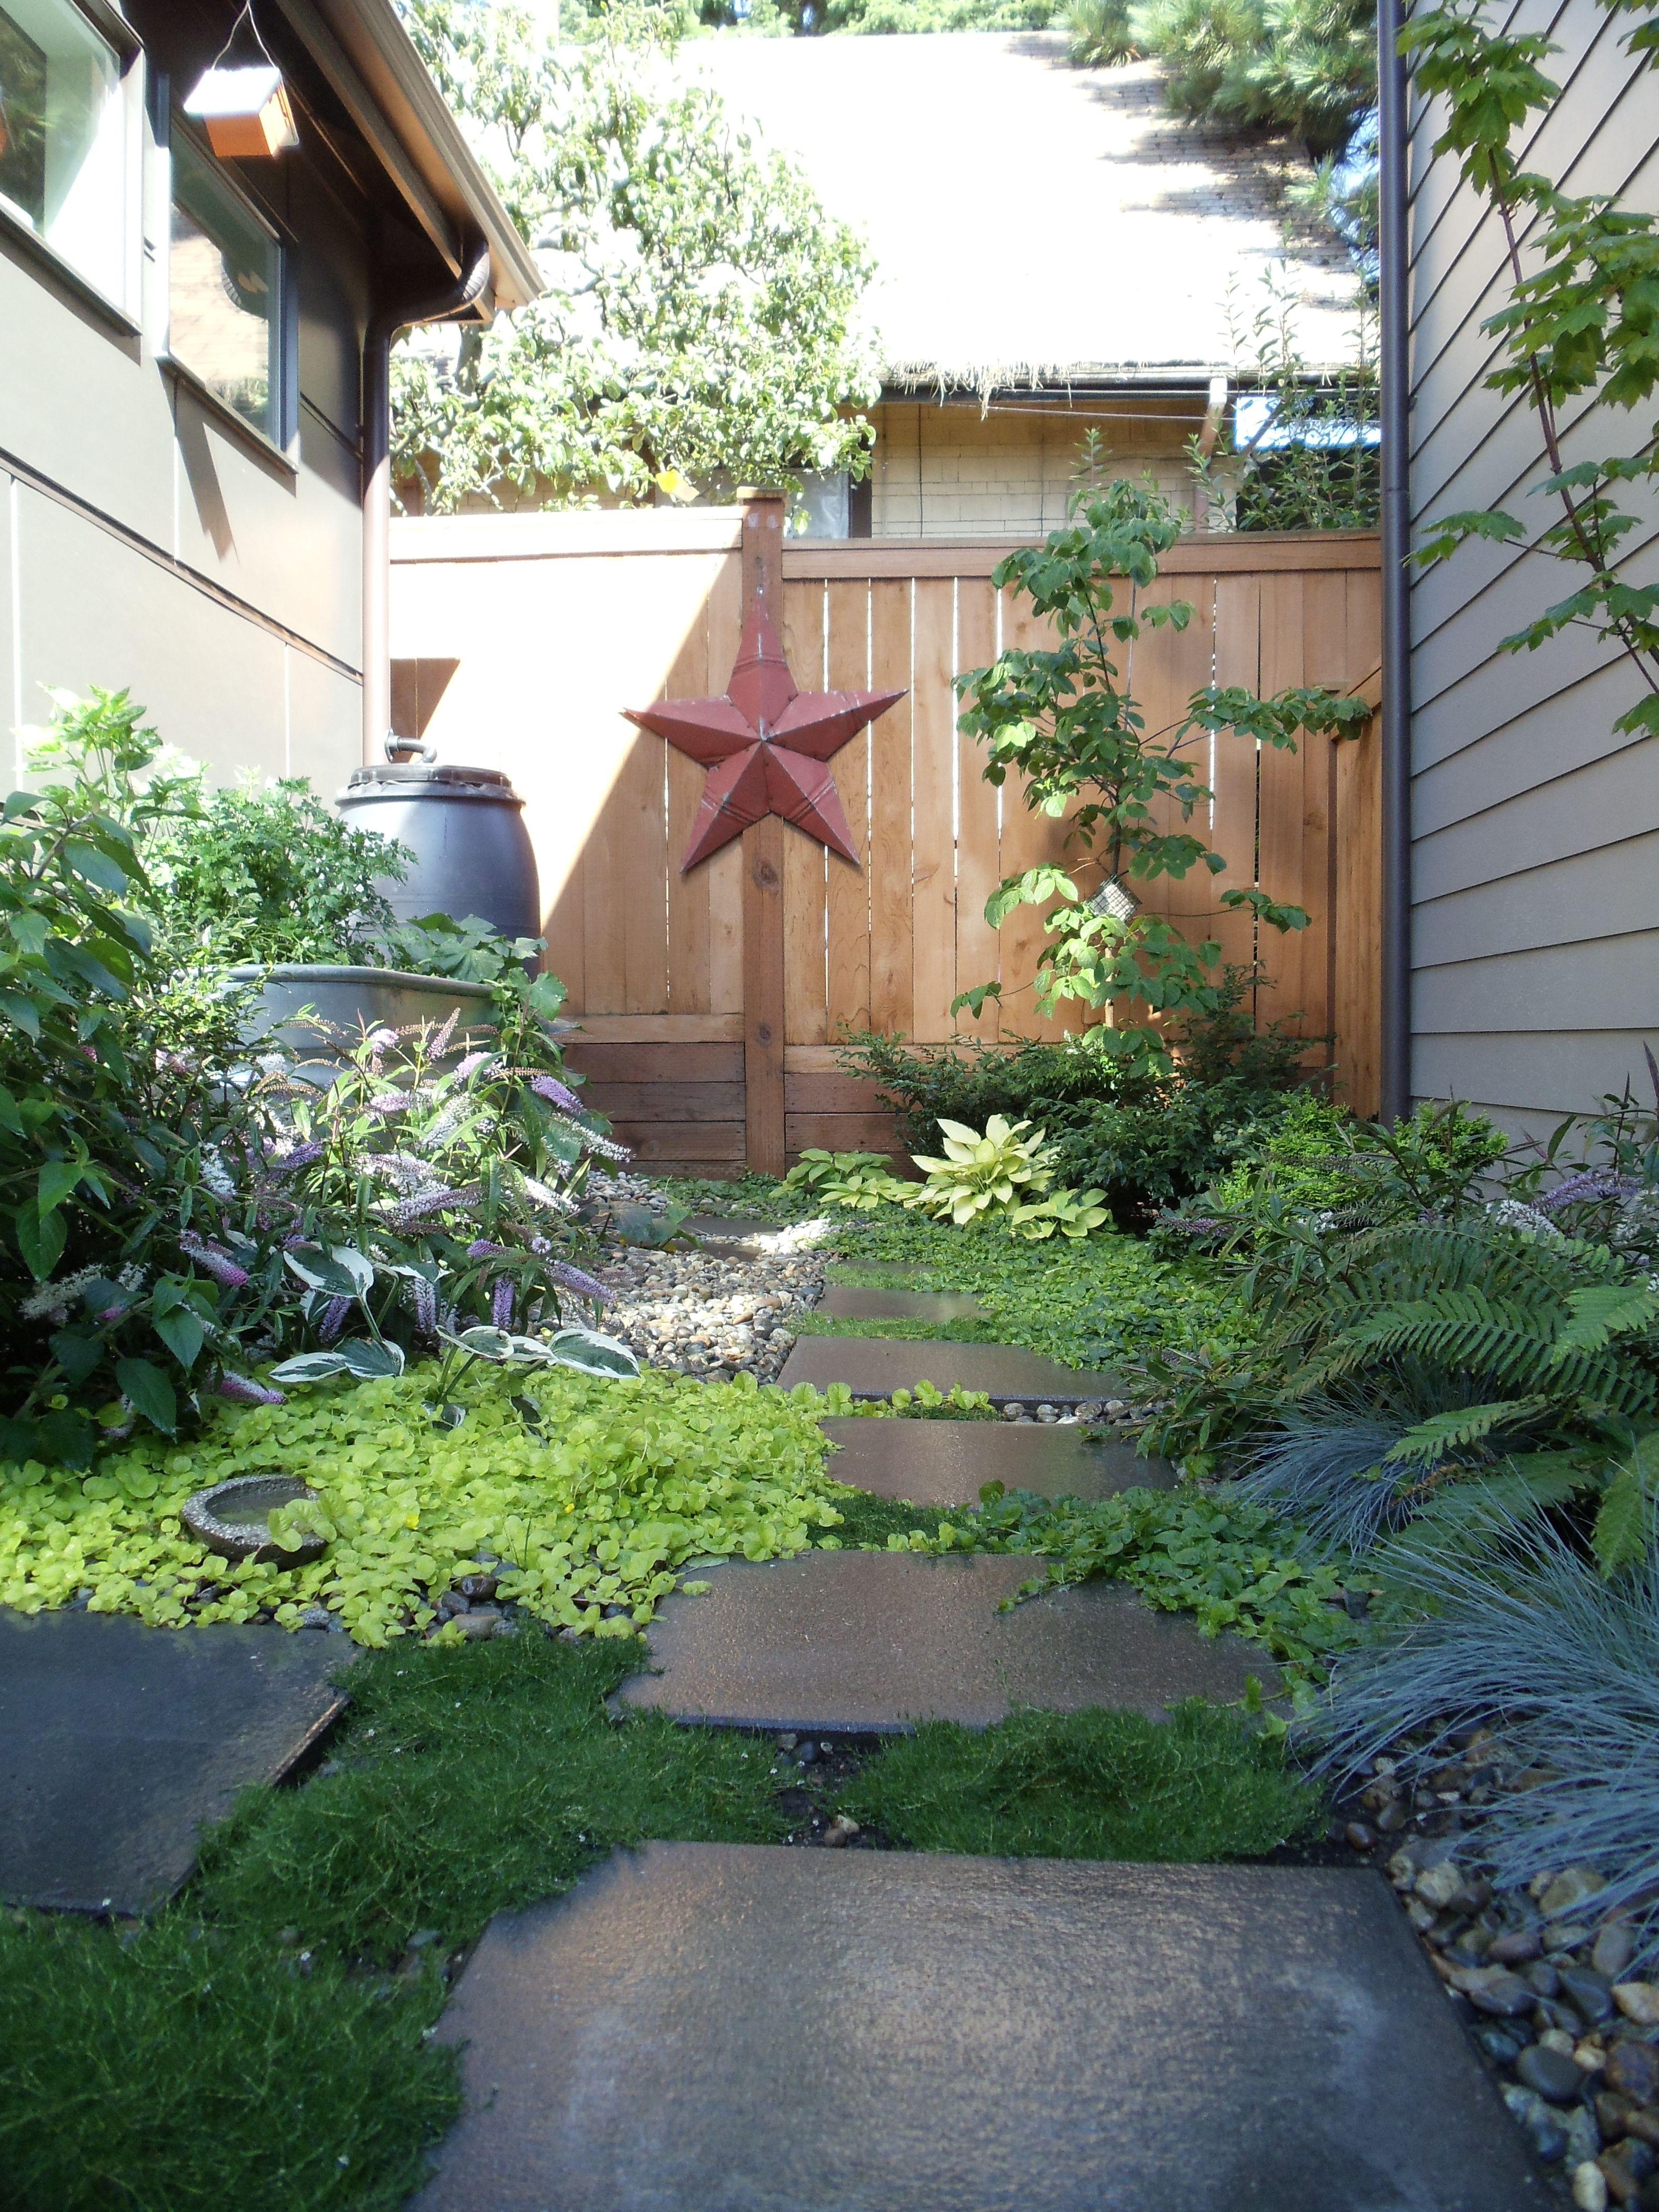 Home Design Backyard Ideas: Pavers, Walkway, Fencing, Side Yard, Landscaping